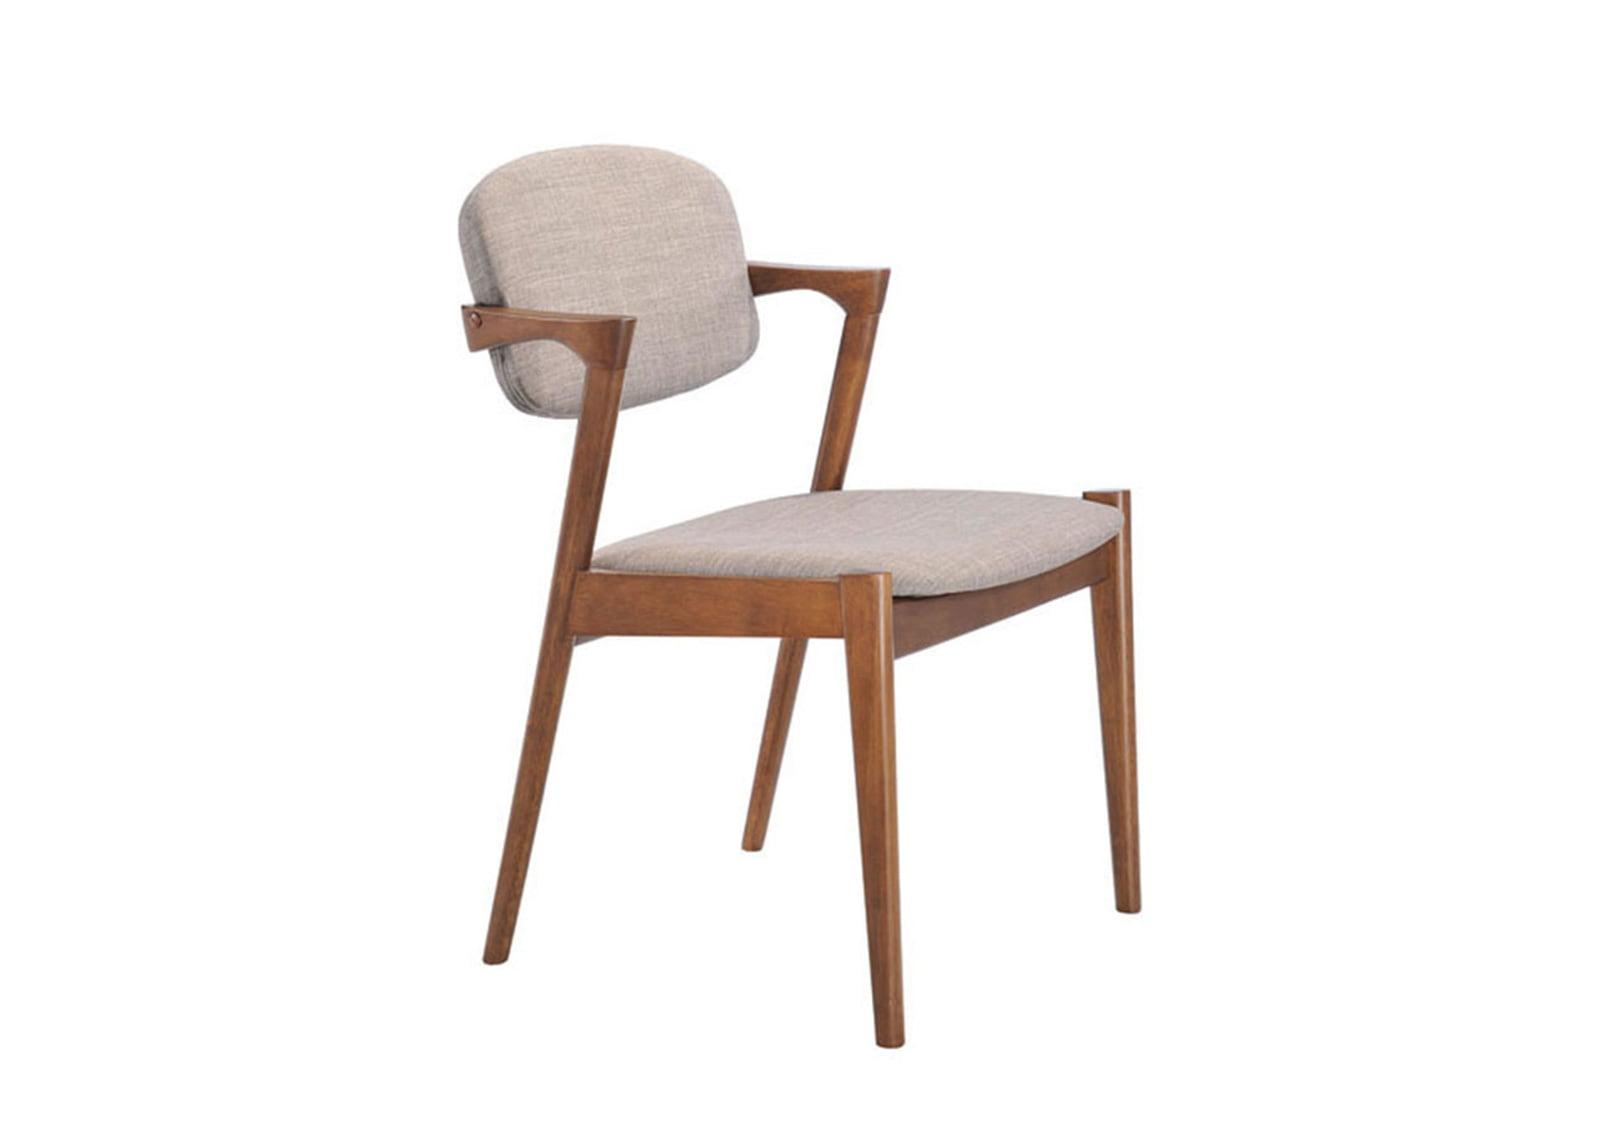 Brickell Dining Chair Dove Gray1 Furnishplus